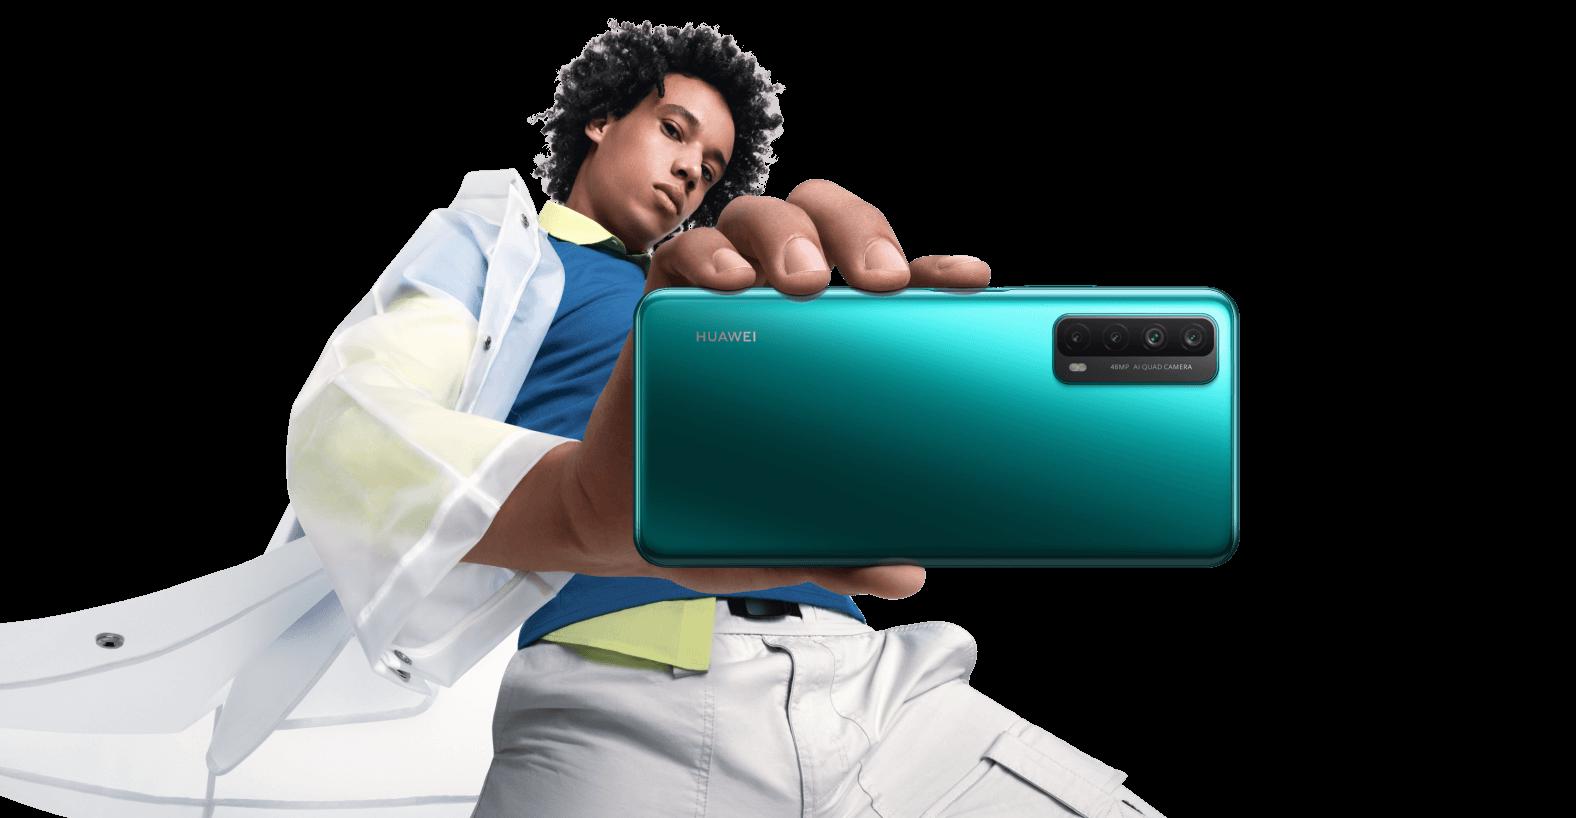 HUAWEI P smart 2021 ID Design